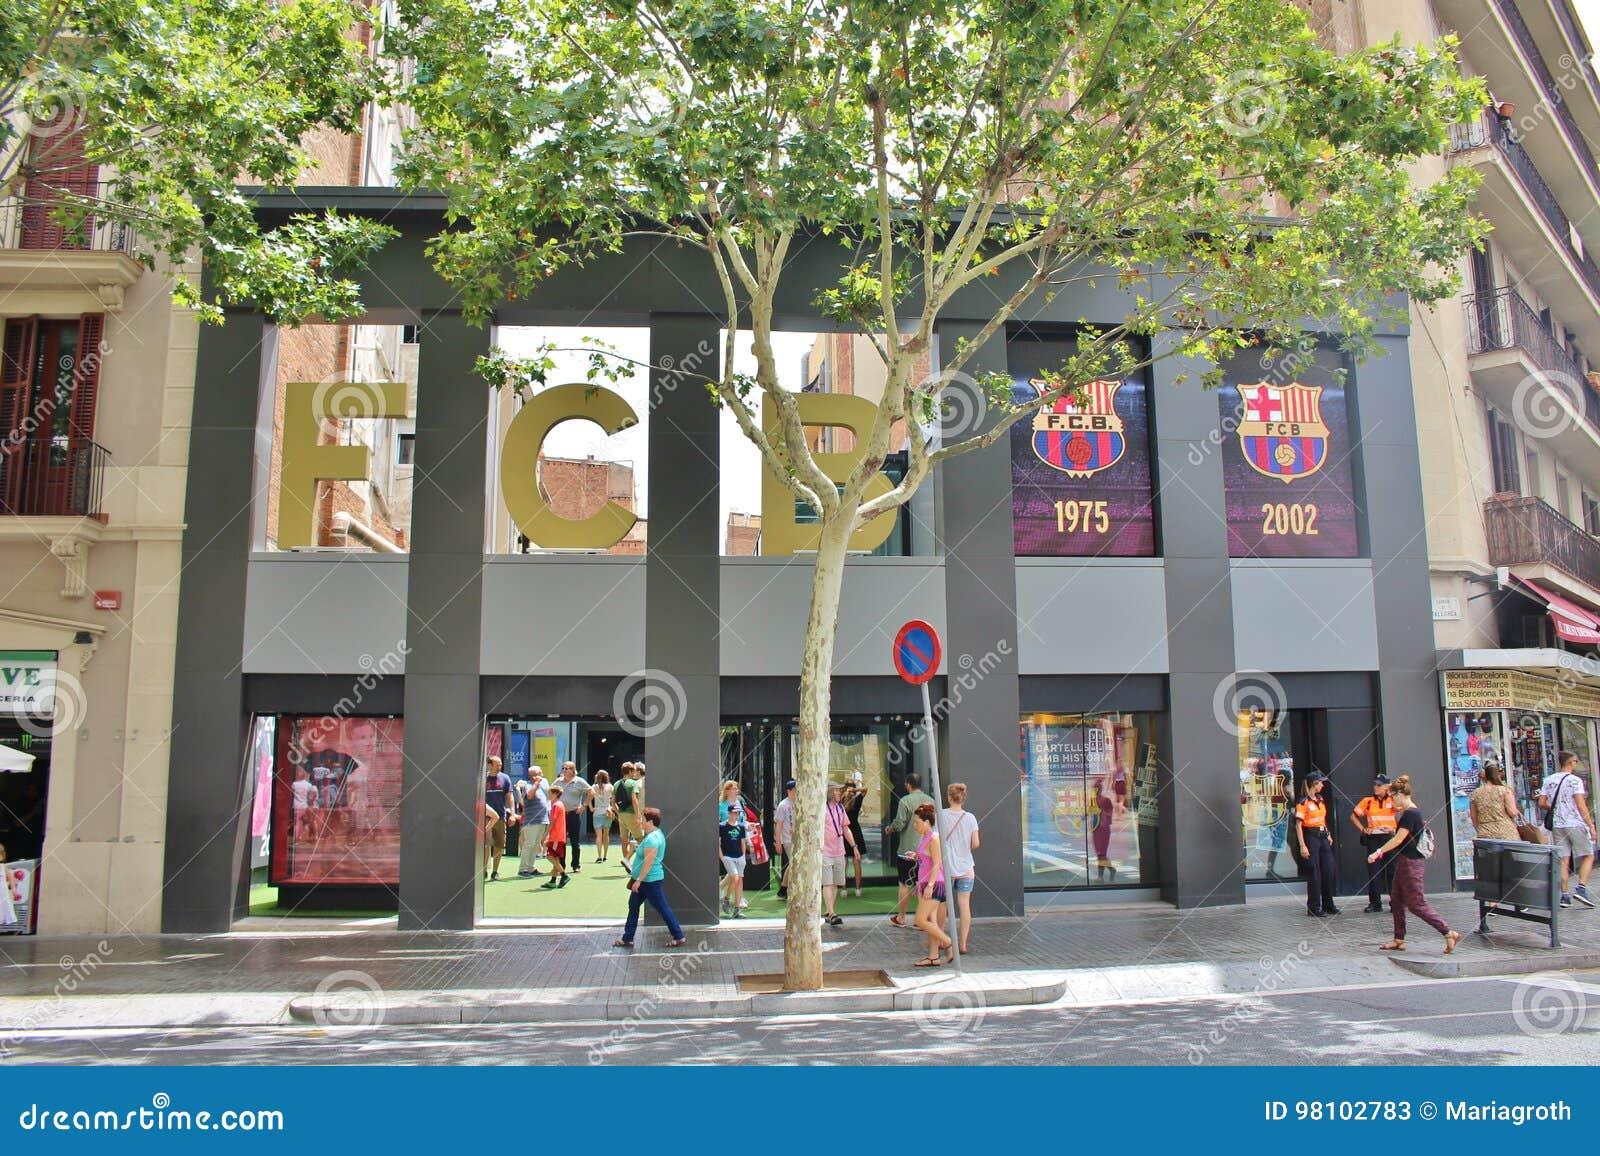 b25c7a0522e69 Fc barcelona official store editorial stock photo image of play jpg  1300x956 Sagrada familia store